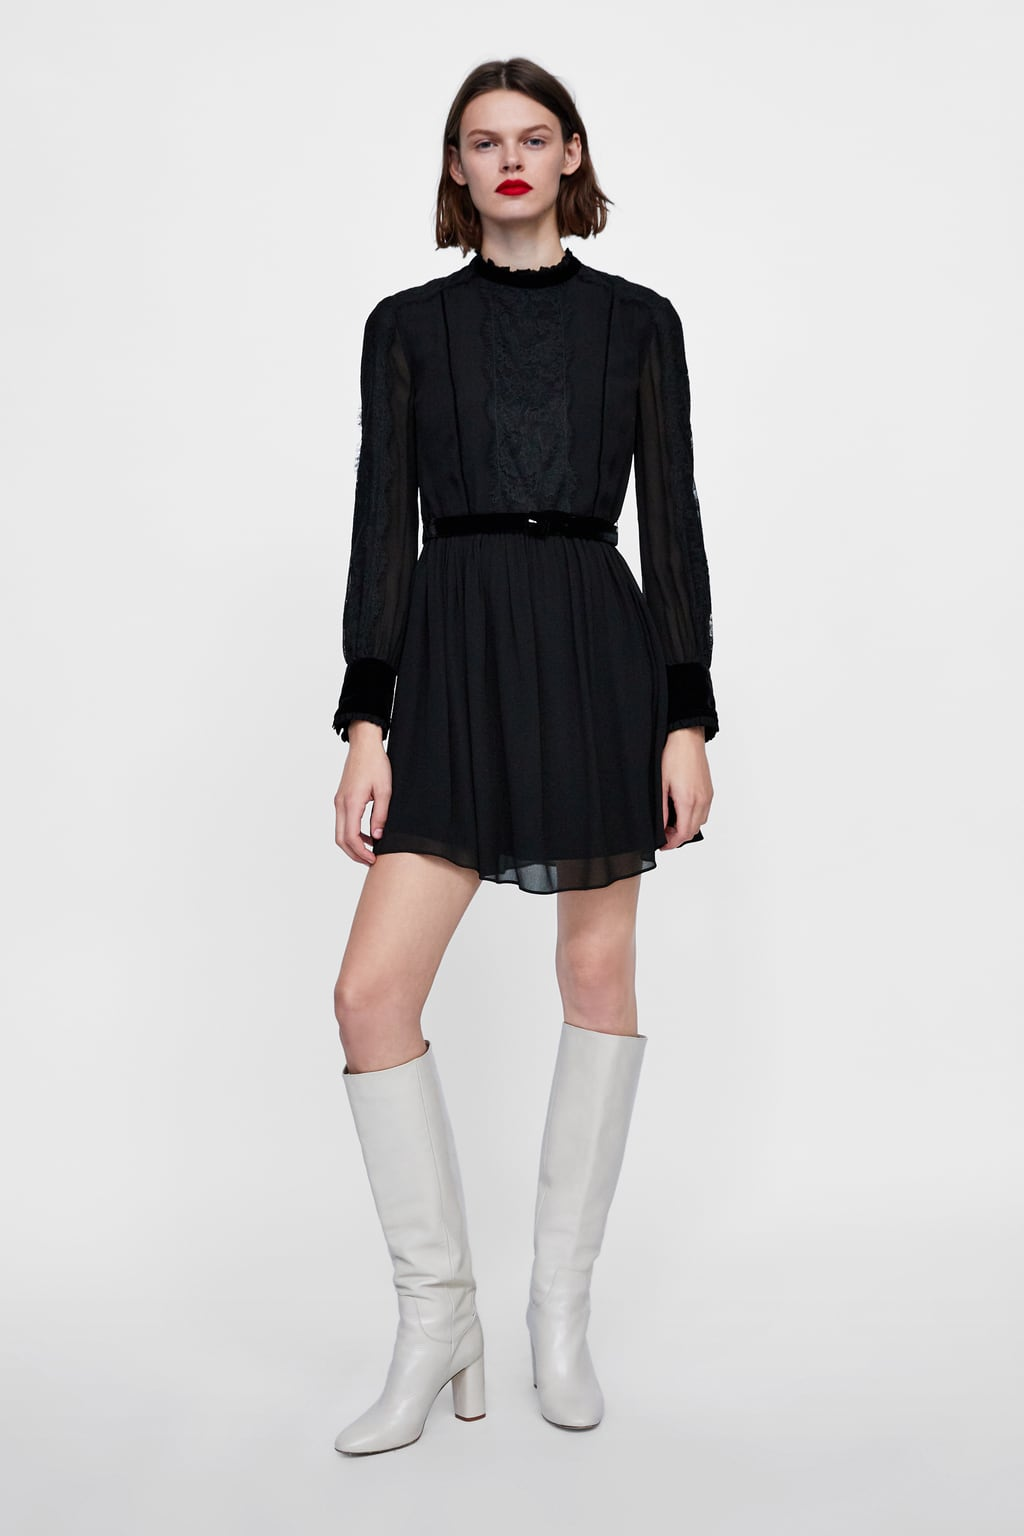 zara black contrasting lace dress